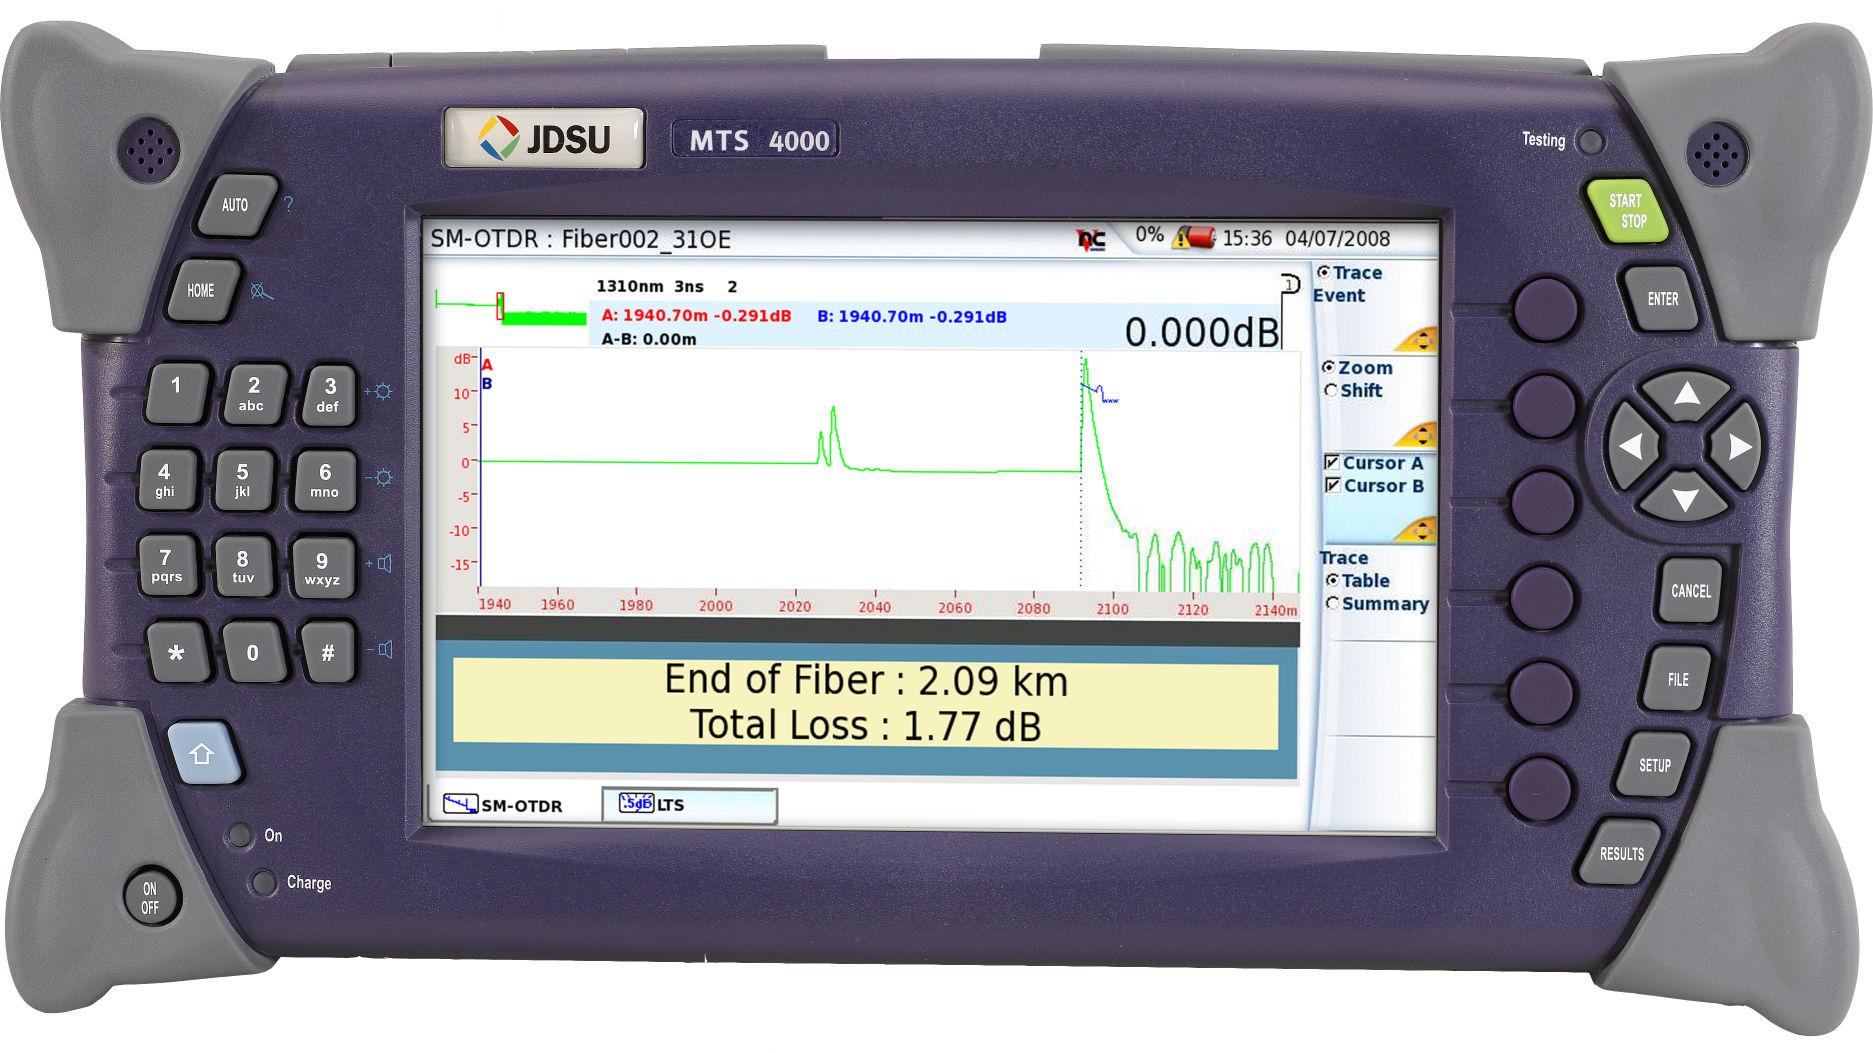 JDSU خصم خاص لمجموعات MTS2000 وMTS-4000